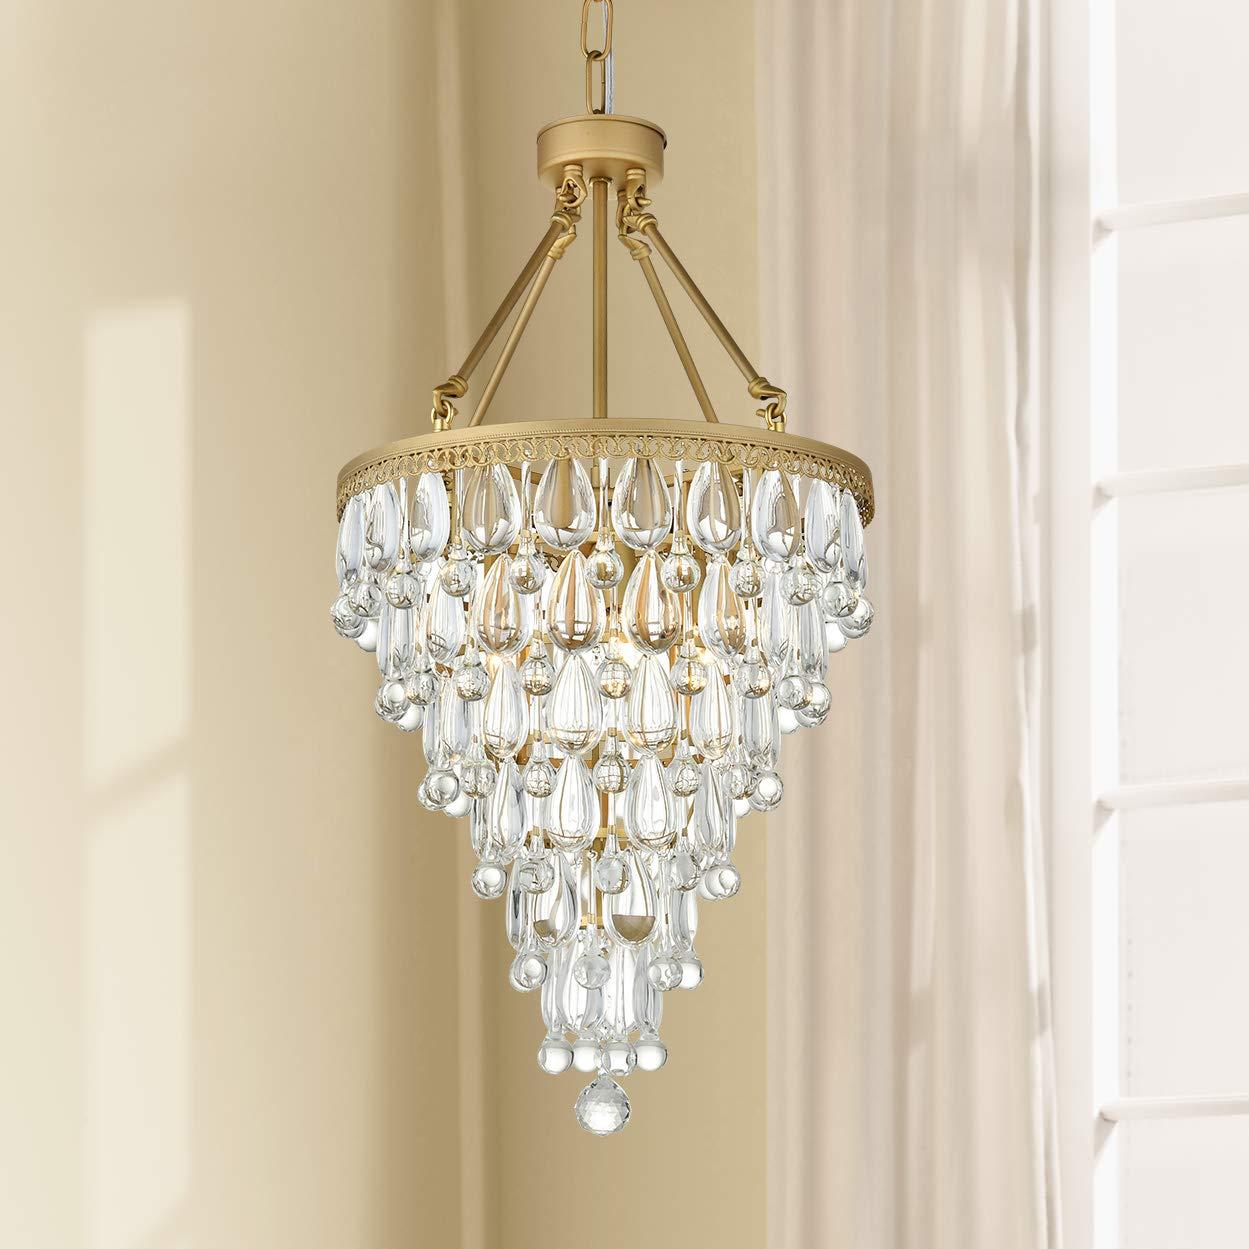 Modern clear crystal raindrop round gold chandelier flush mount led ceiling light fixture pendant lighting lamp for dining room bathroom bedroom livingroom